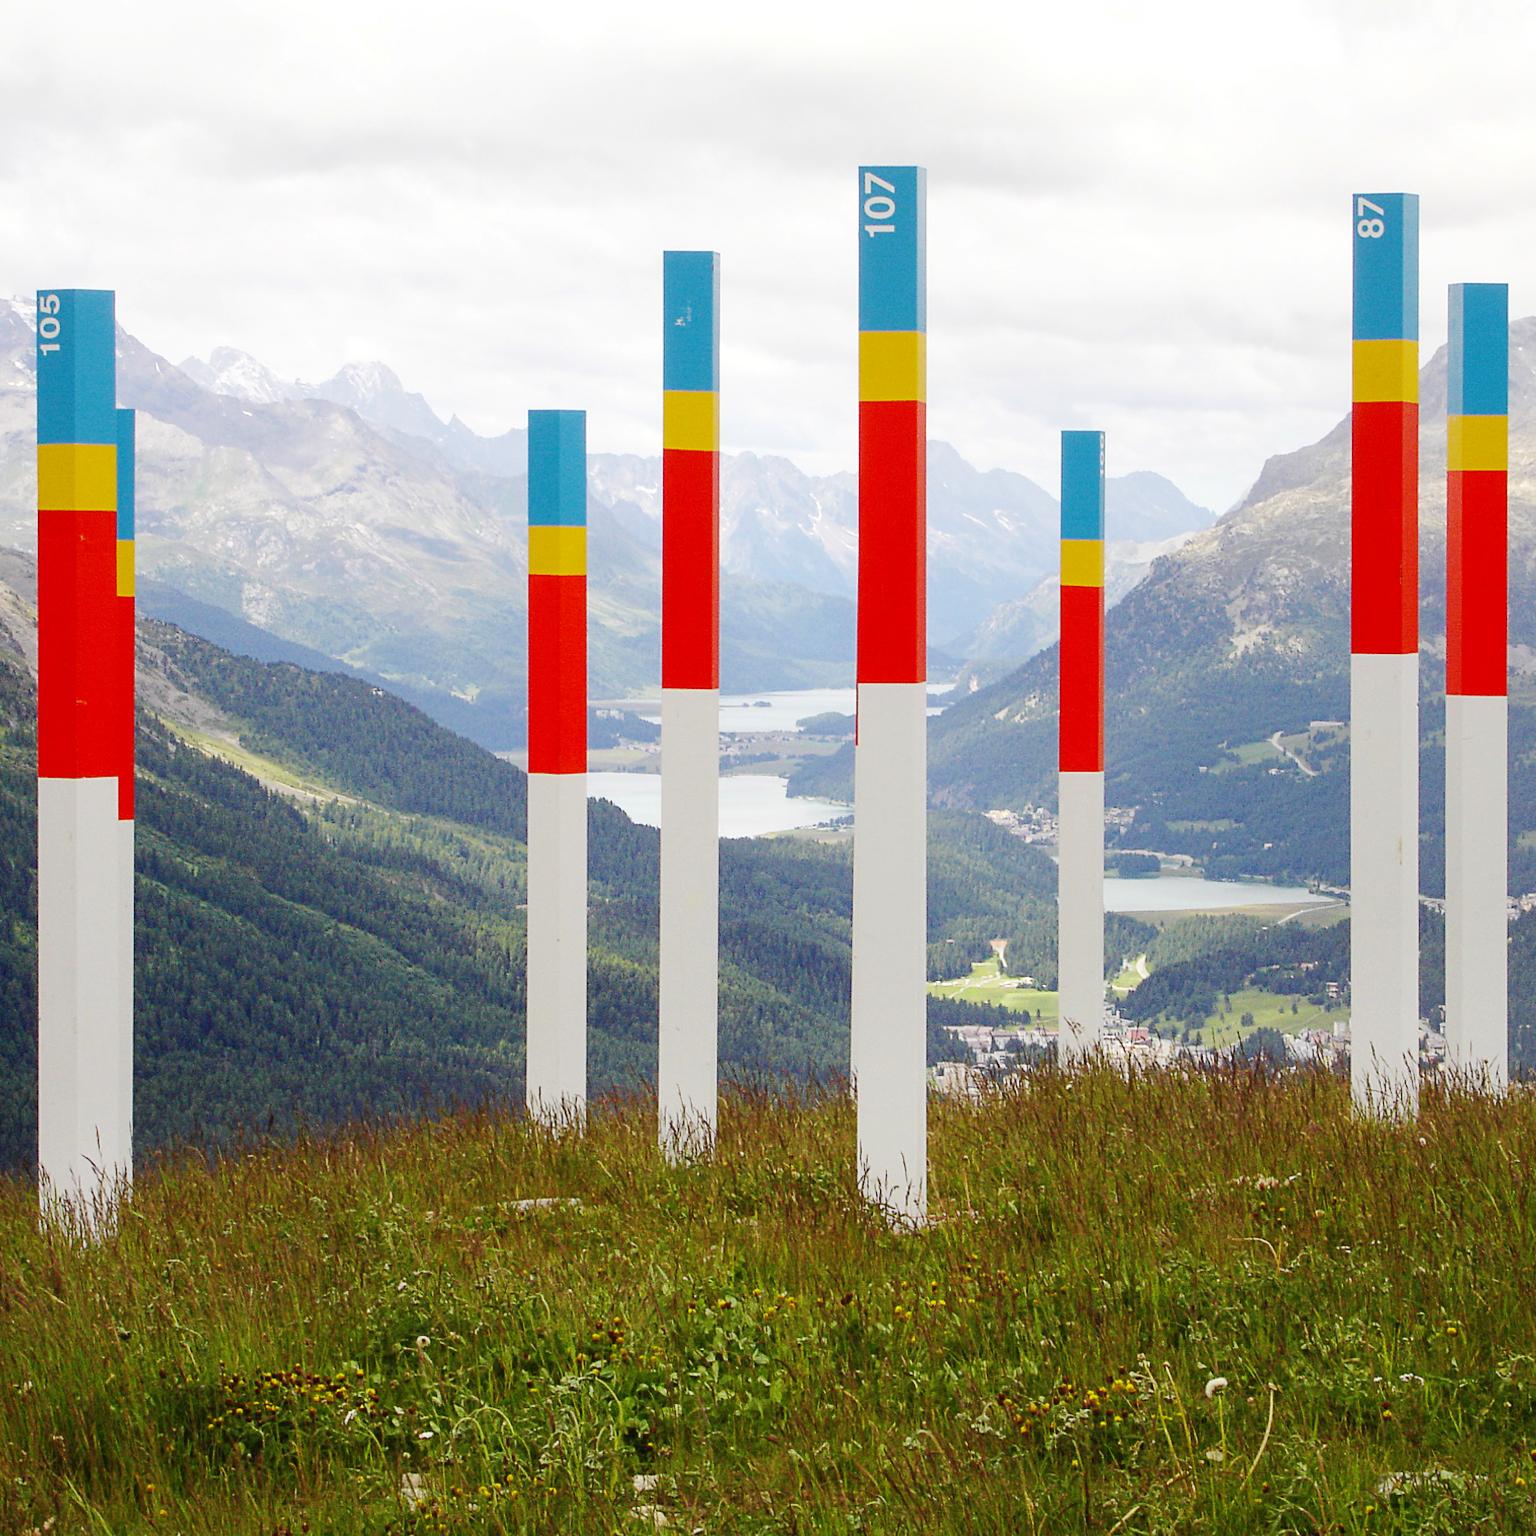 Celerina Bergbahnen Land-Marker